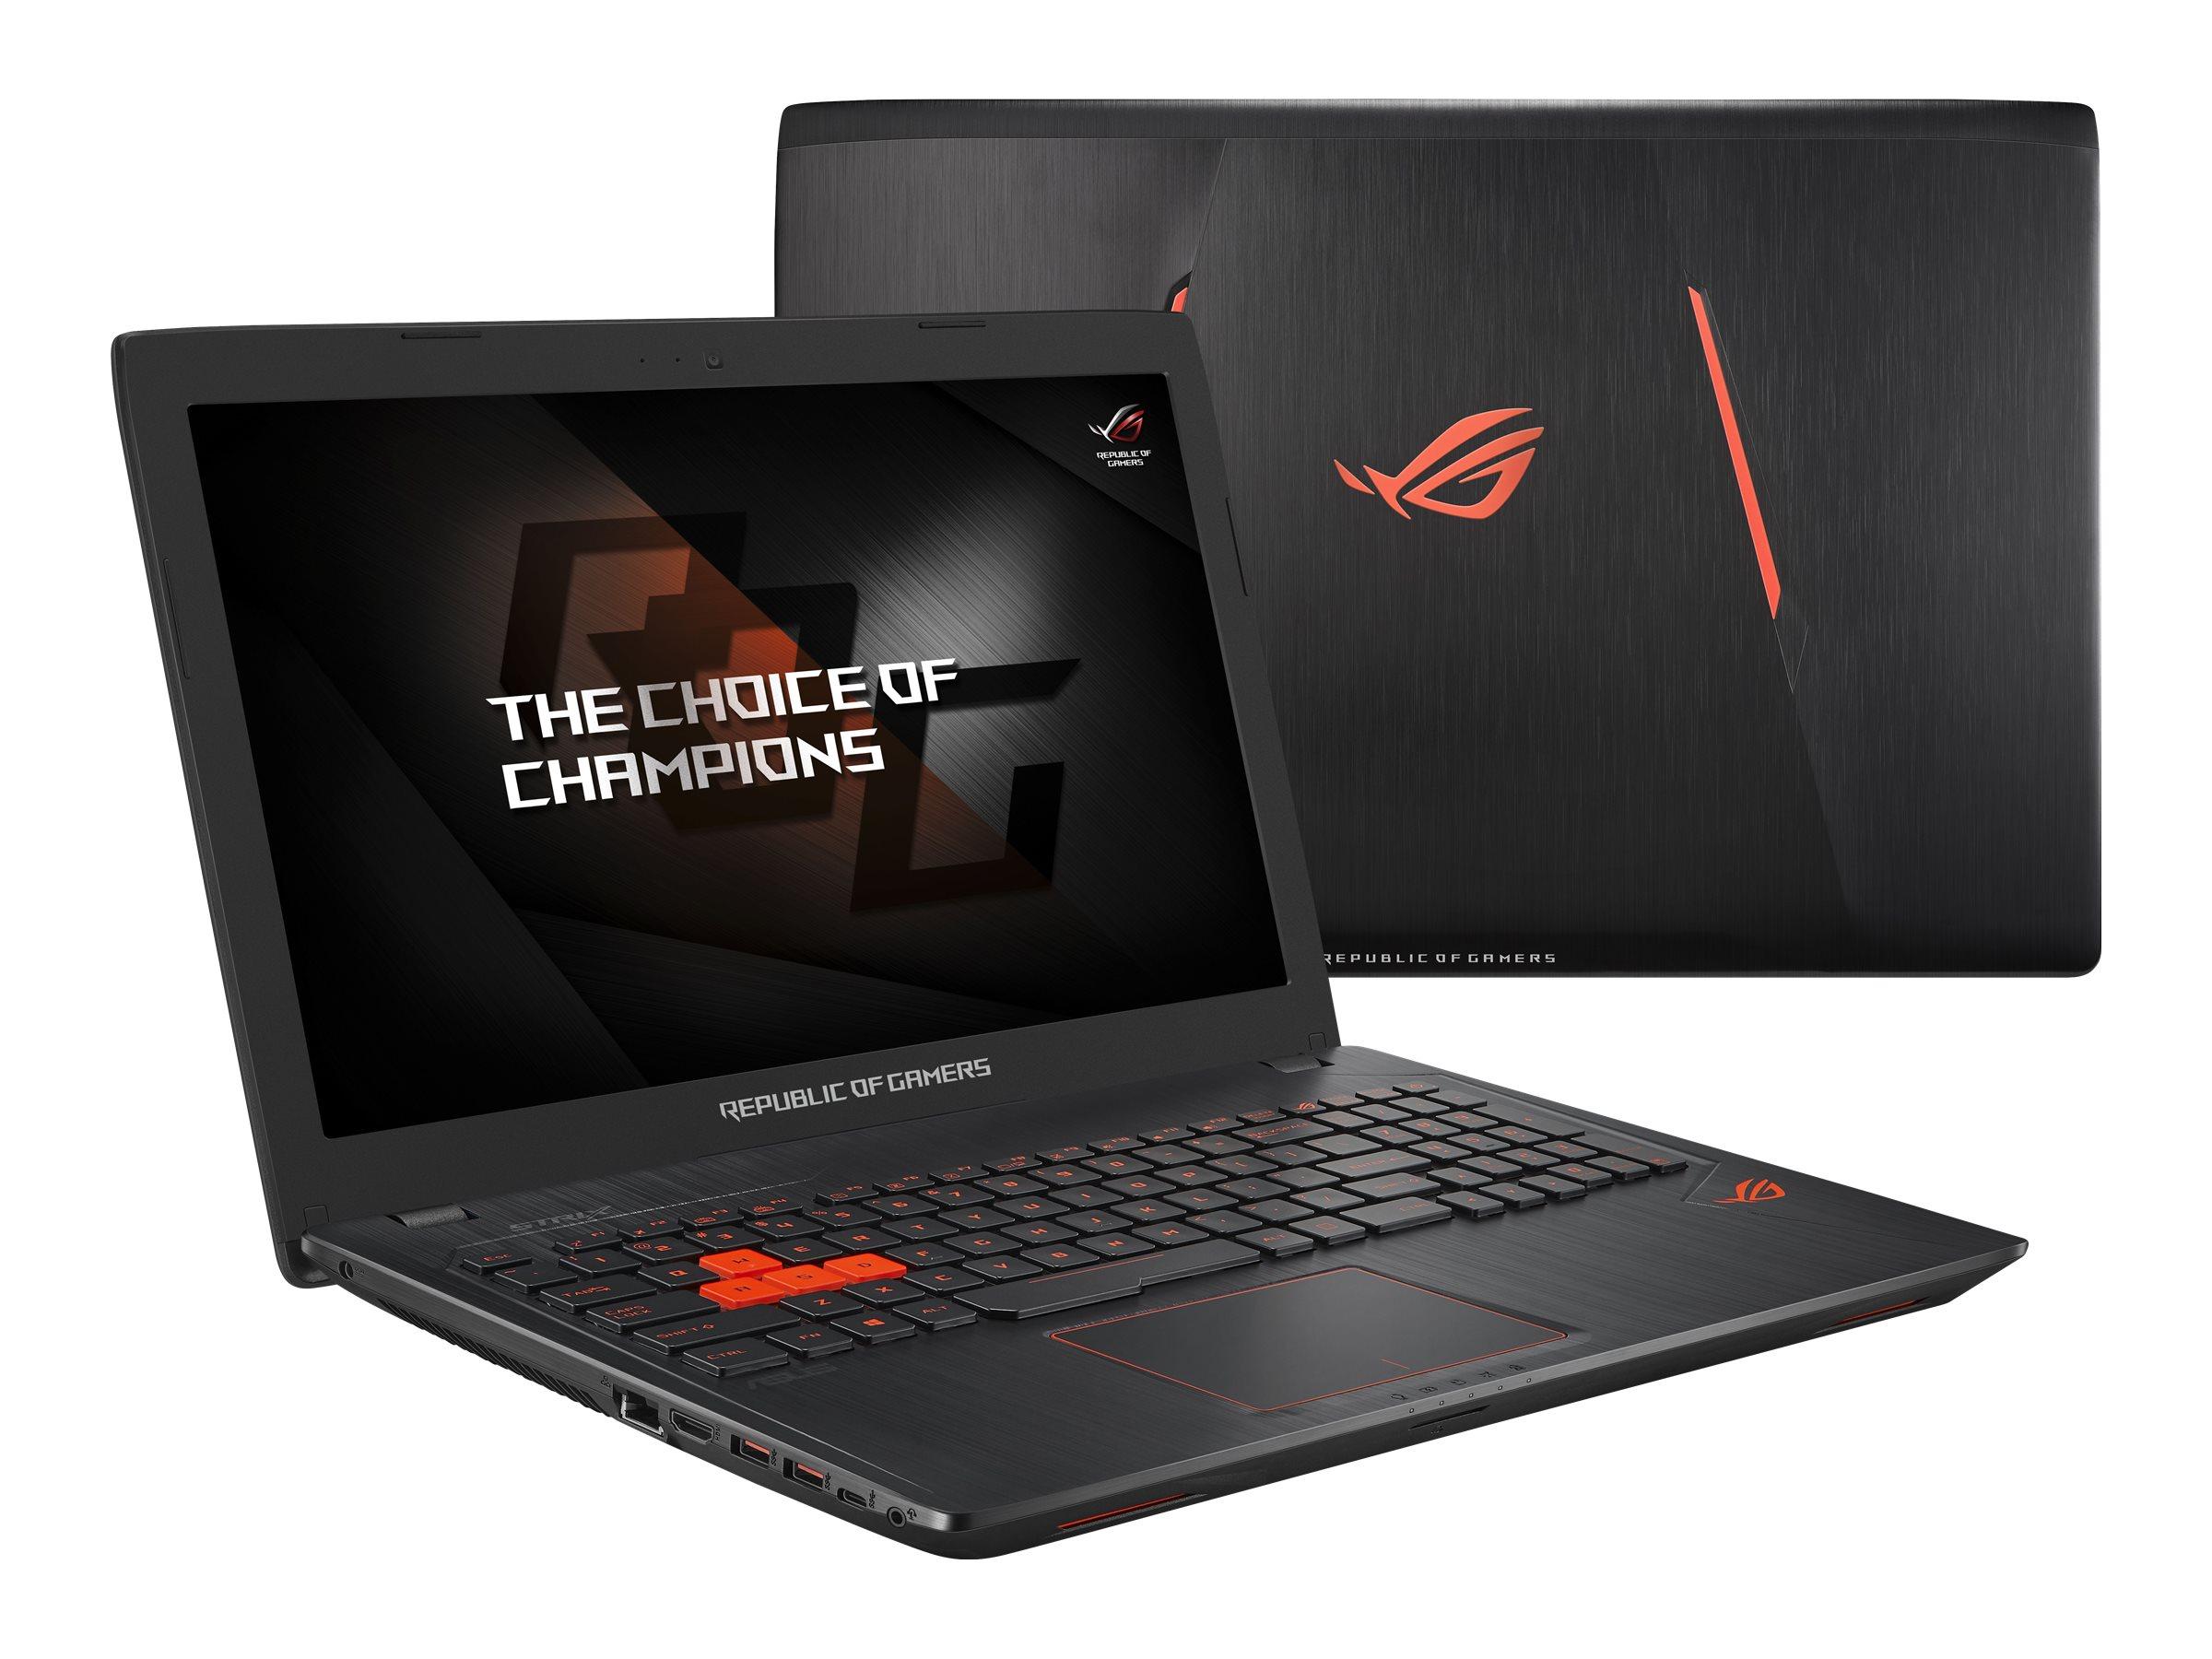 Computer Desk Ideas Asus Rog Strix Gl553vd Gaming Laptop Review